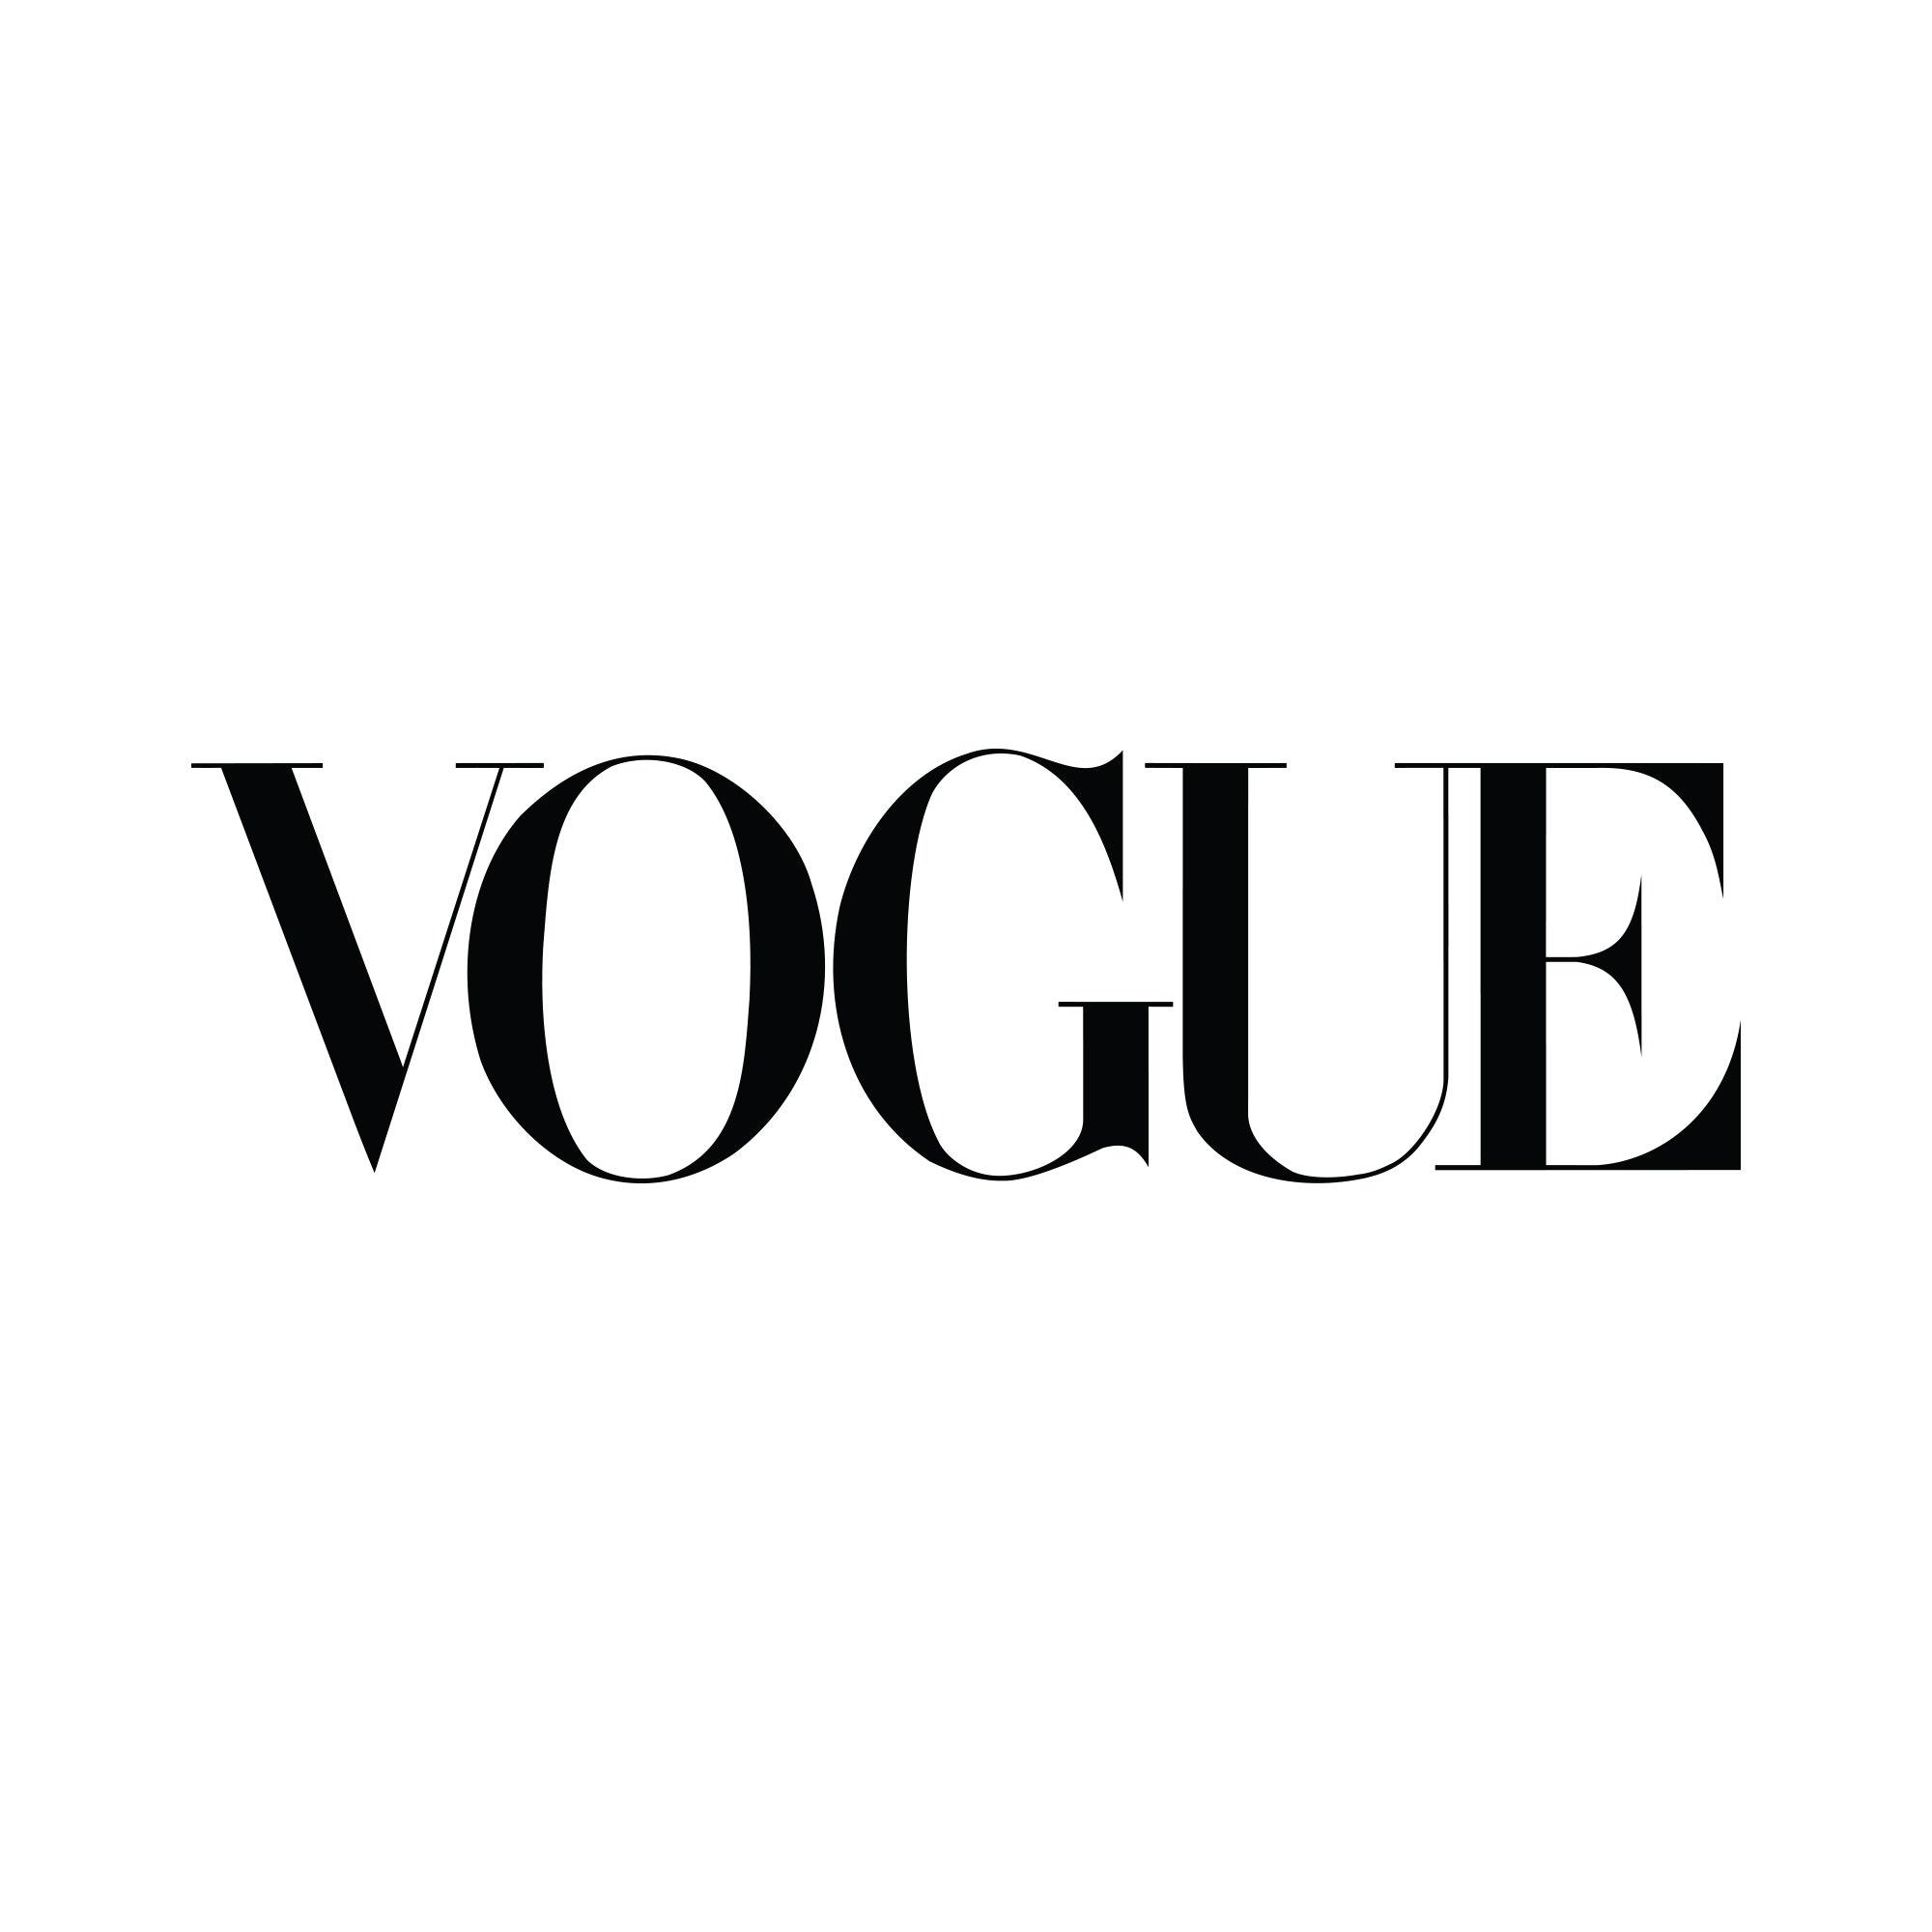 00-promo-image-vogue-logo